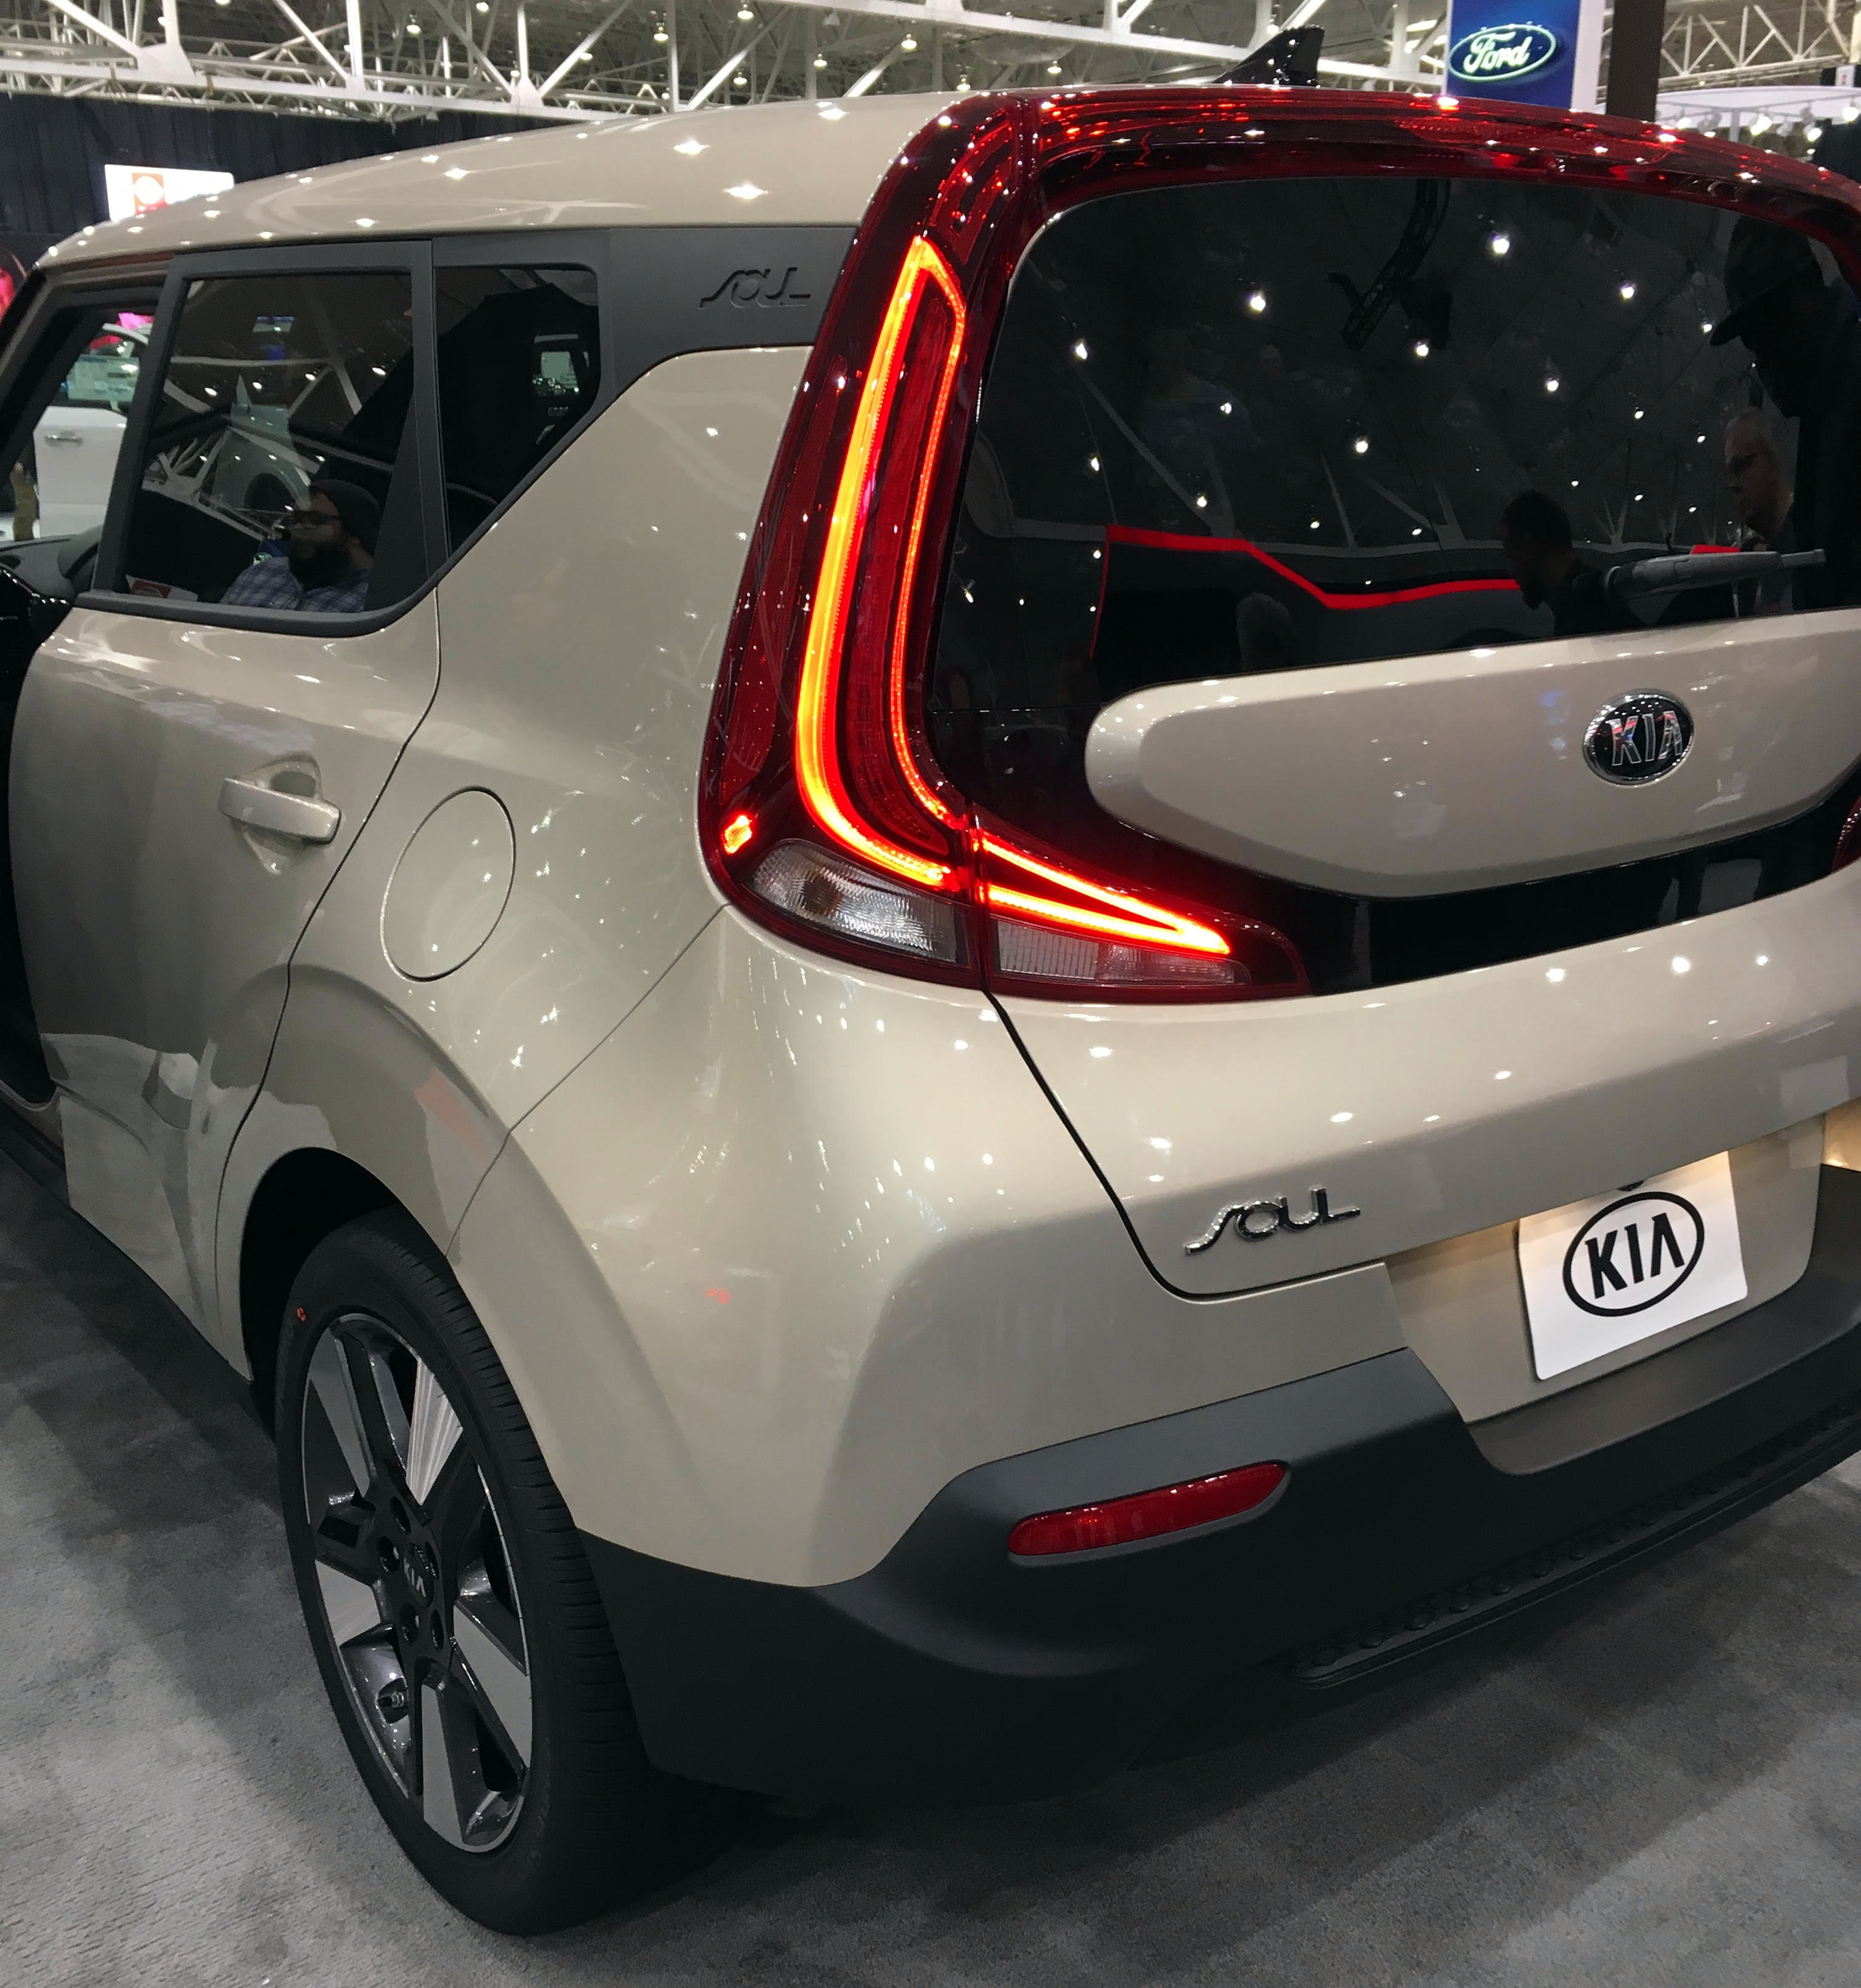 Cleveland Auto Show 2020.File 2020 Kia Soul Sk3 Cleveland Auto Show Jpg Wikipedia